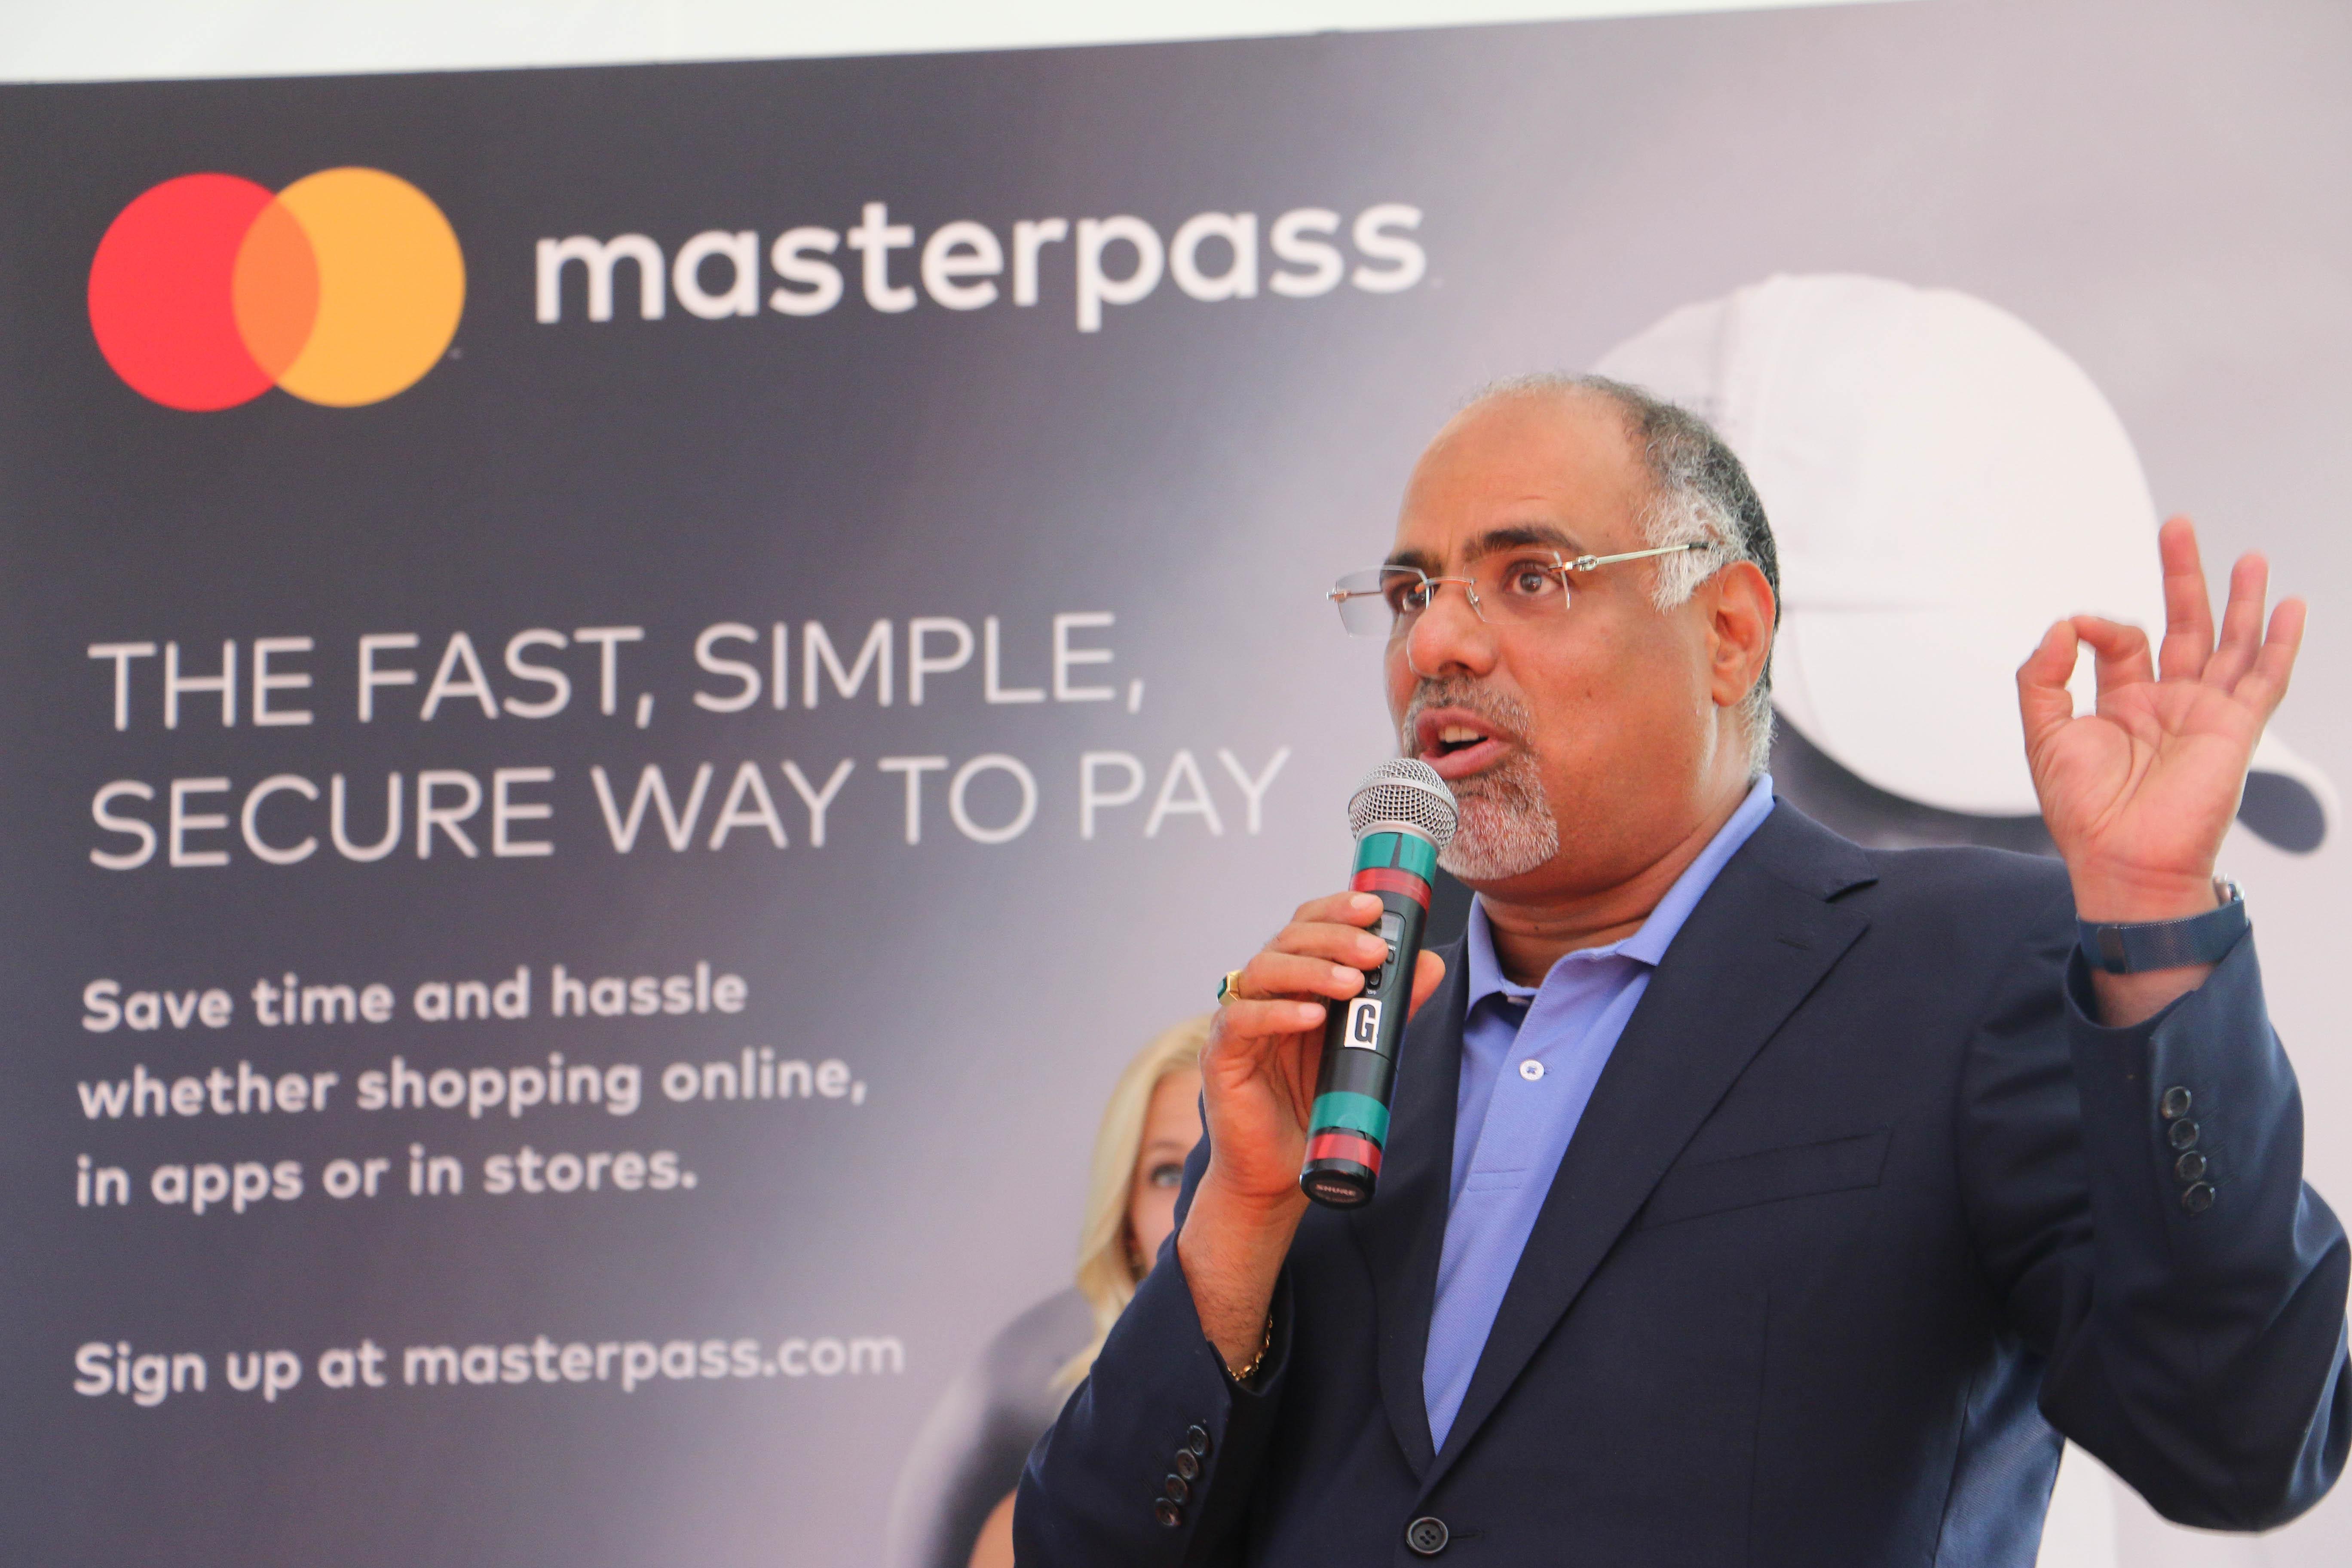 Mastercard-masterpass-1-graeme-mcdowell-3